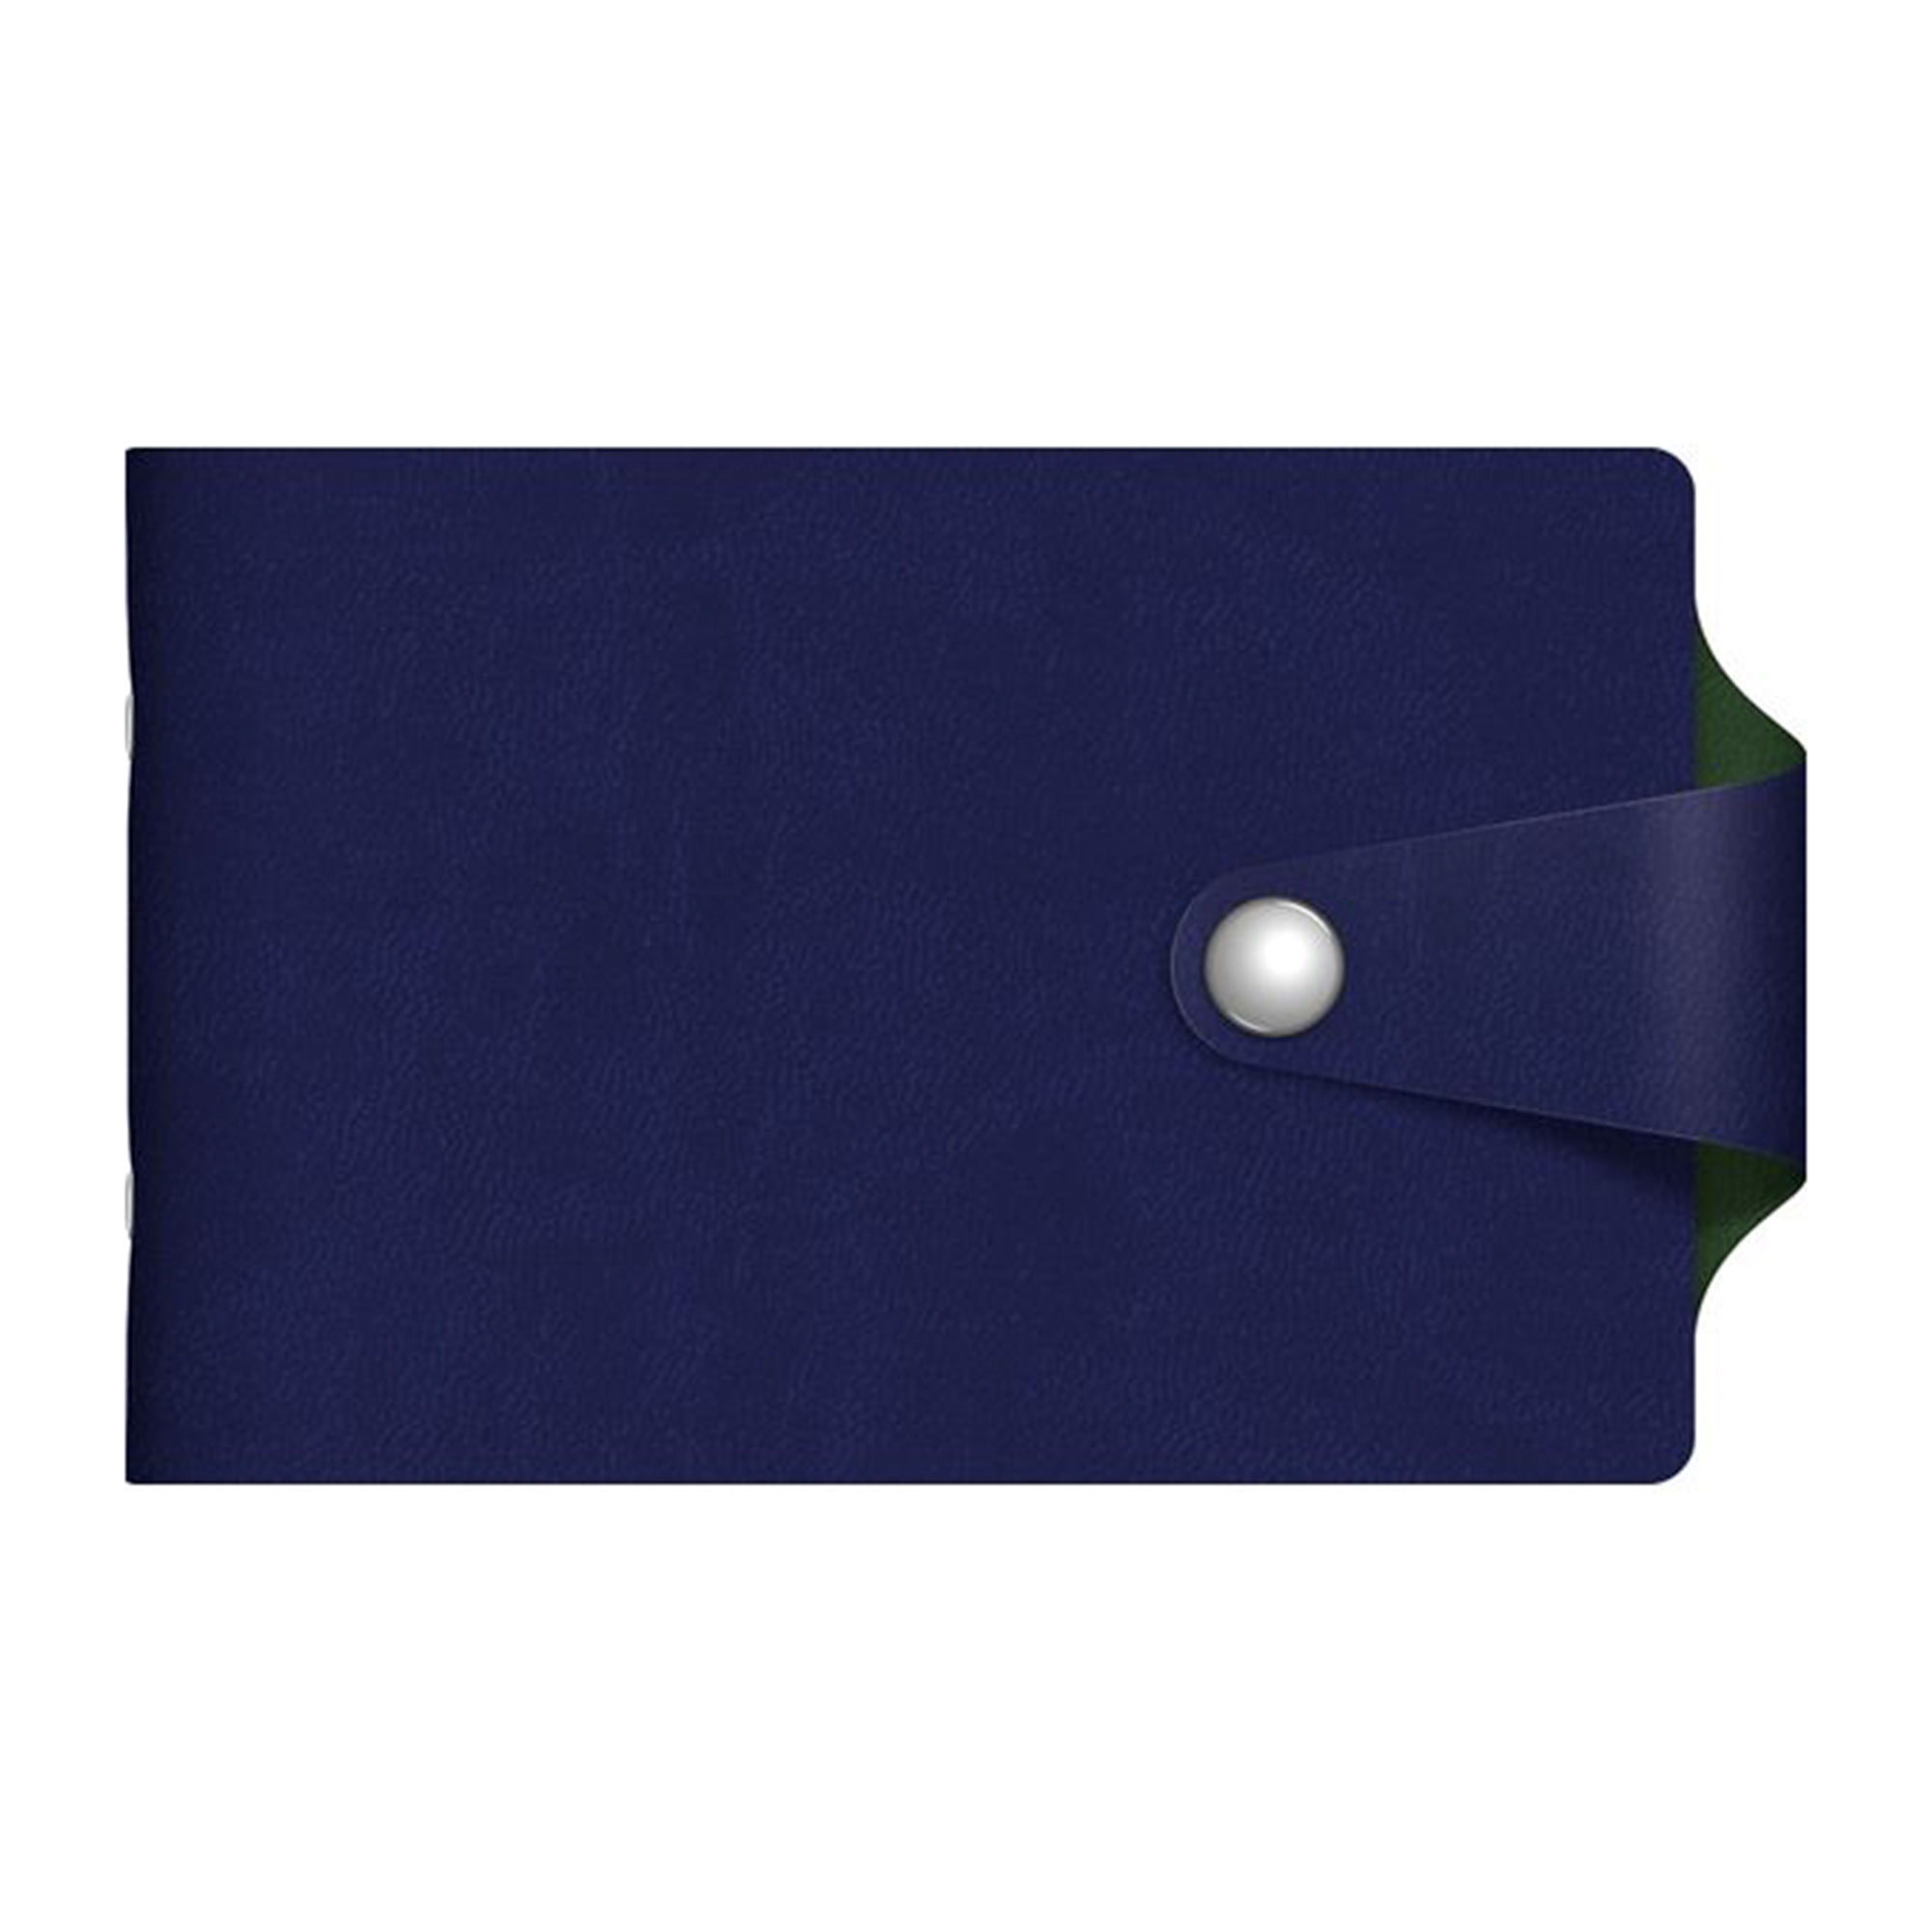 Визитница Hatber 12 карманов Vivella Bicolour синий/зеленый